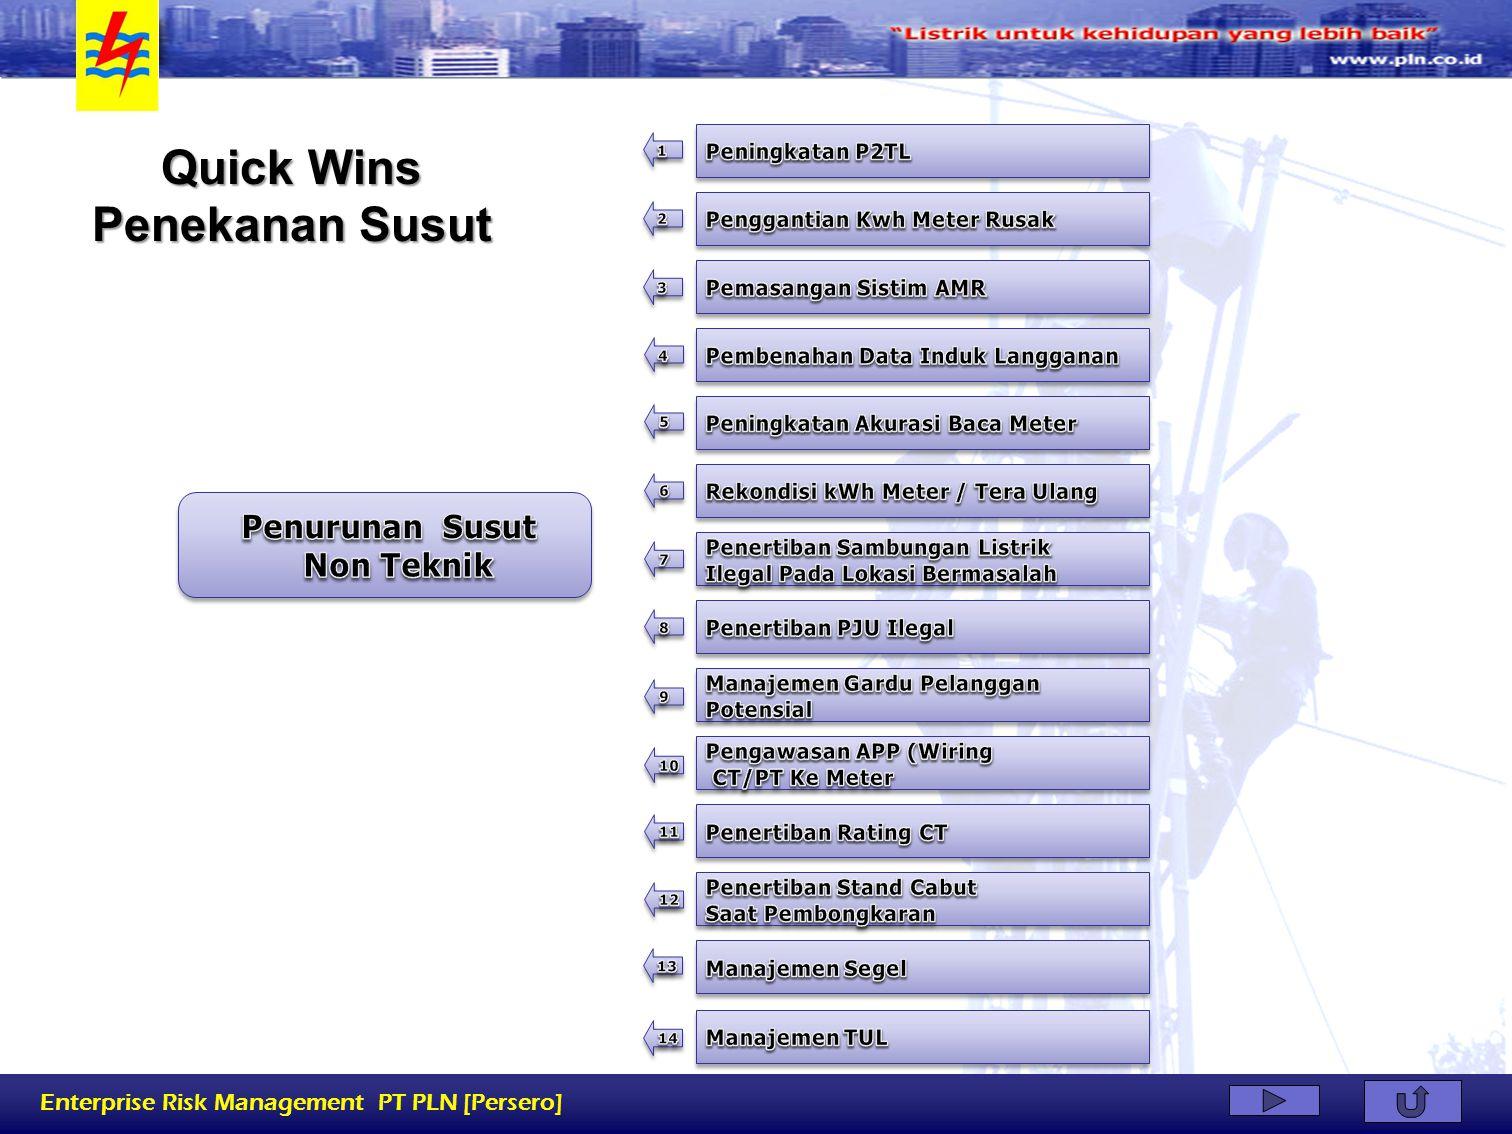 Enterprise Risk Management PT PLN [Persero] Quick Wins Di bidang Penagihan